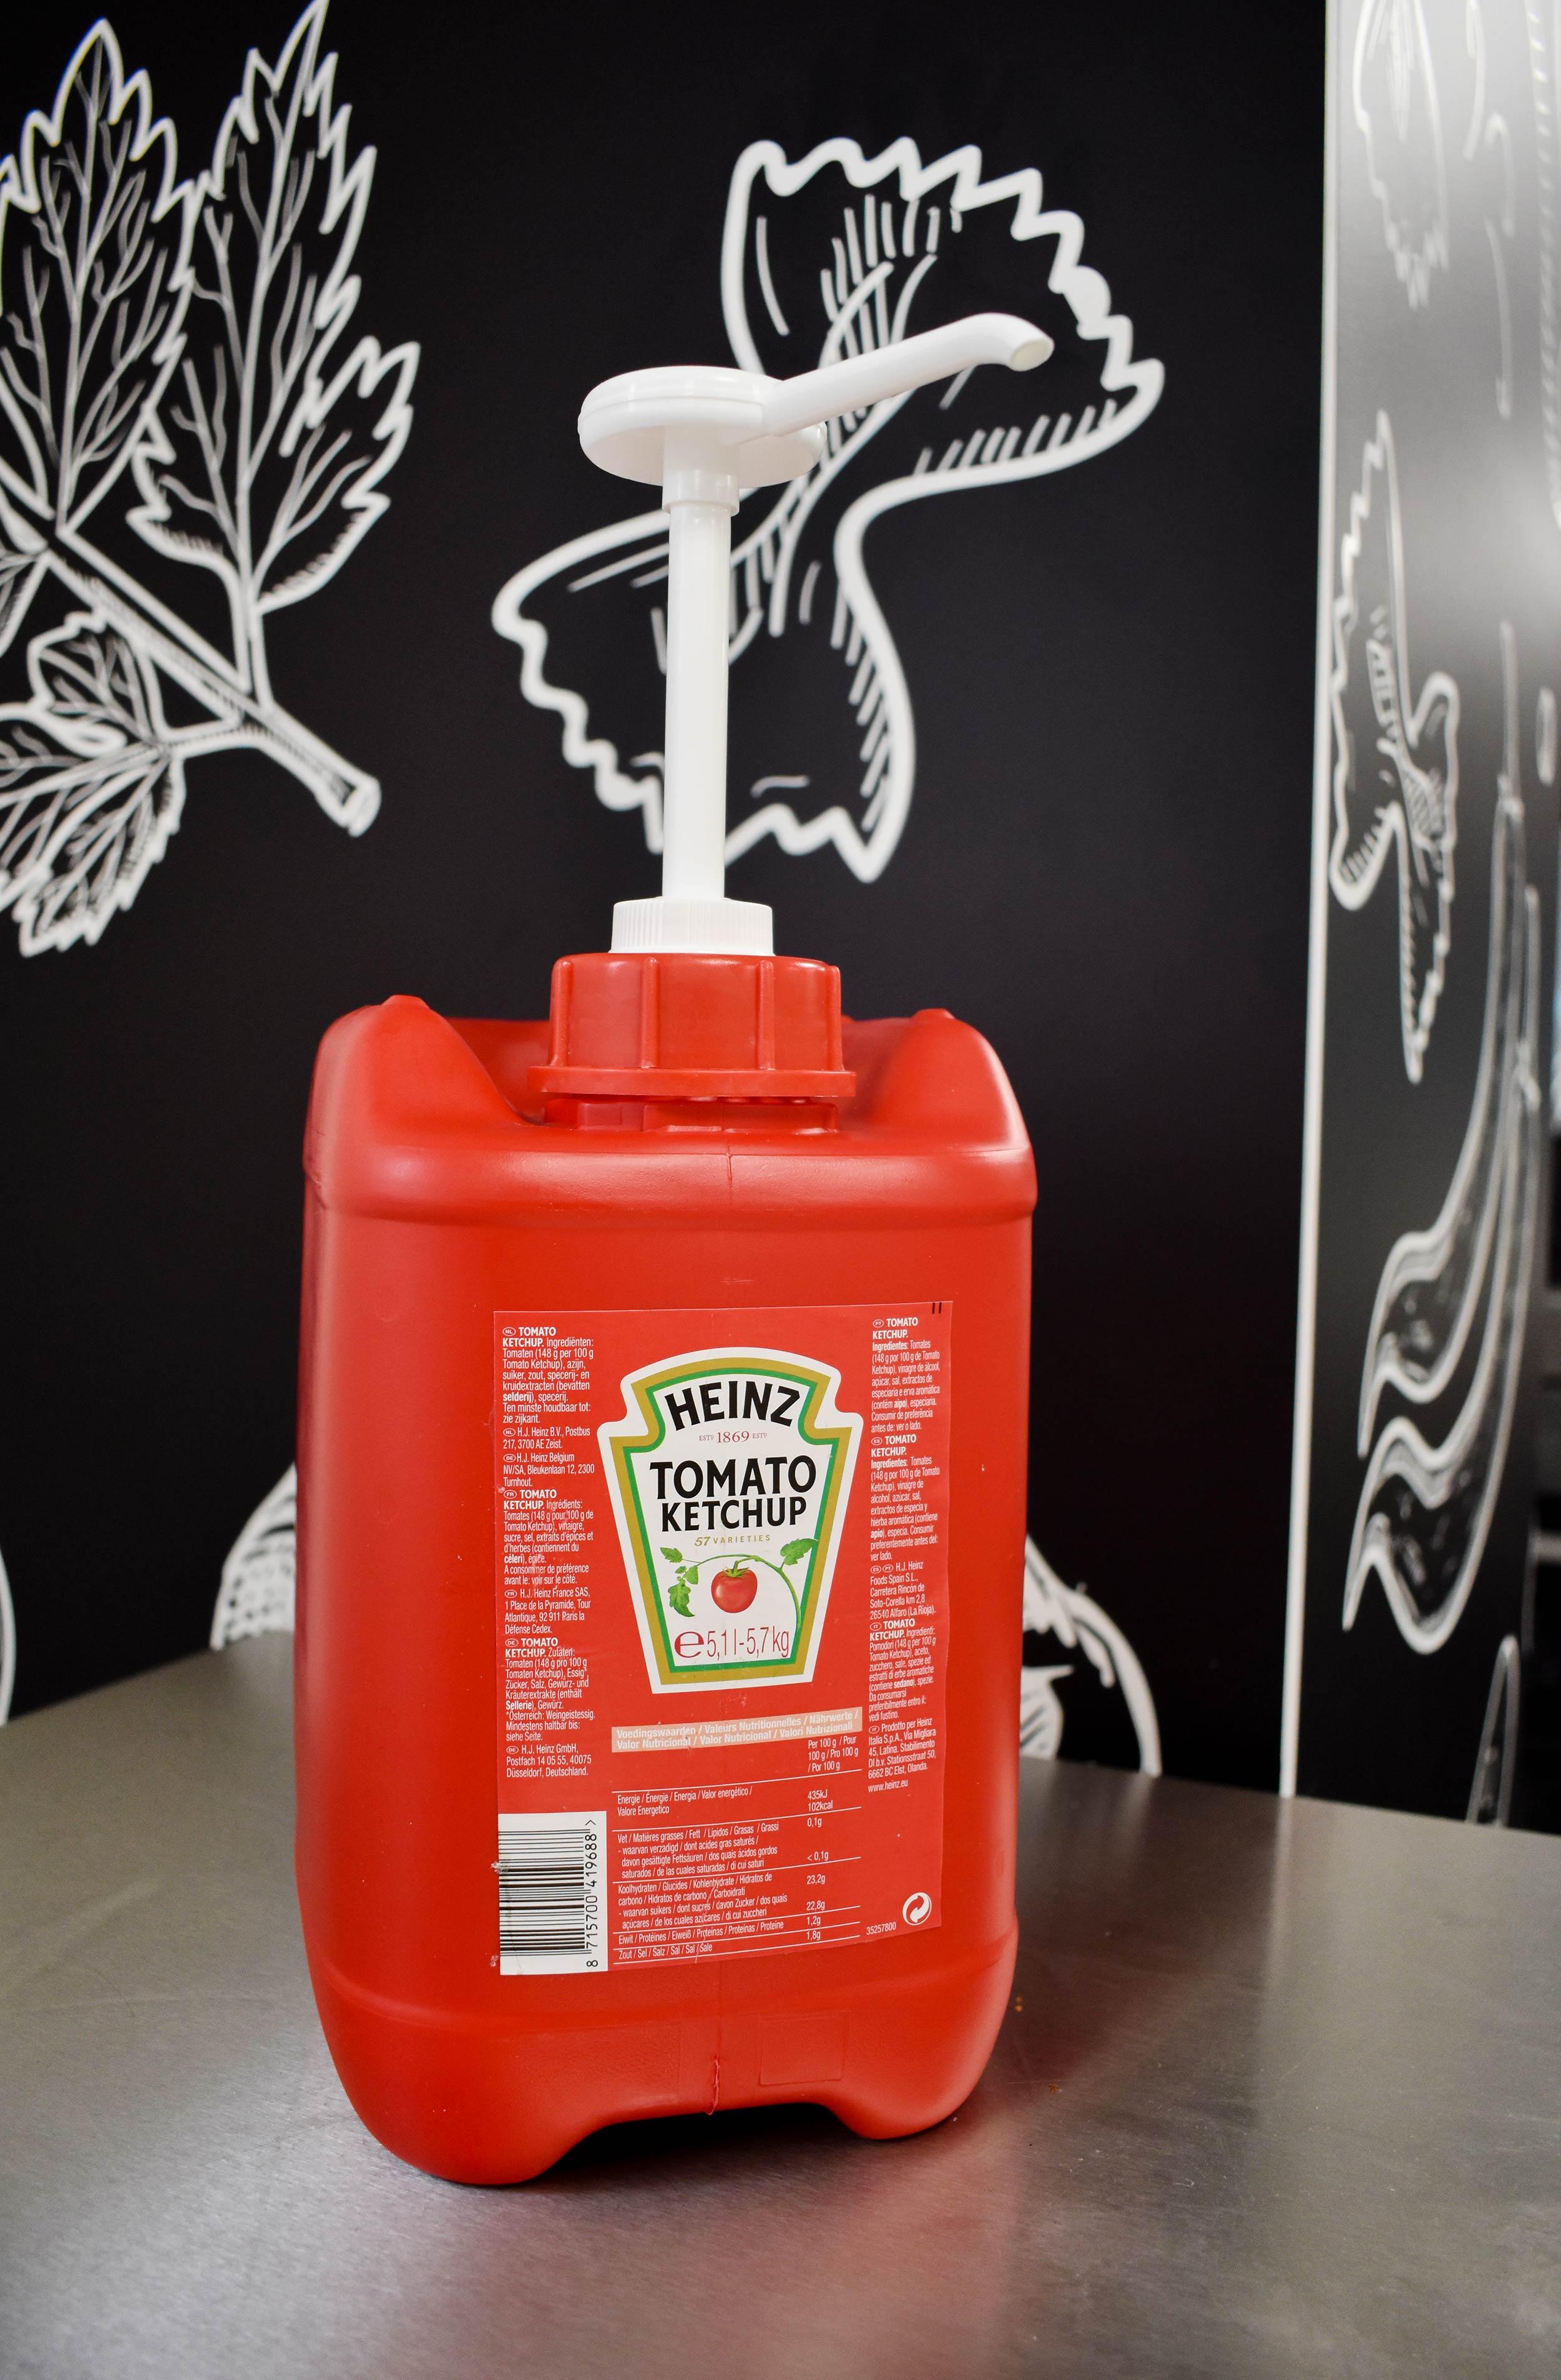 Heinz Tomato Ketchup 10,2lKanister